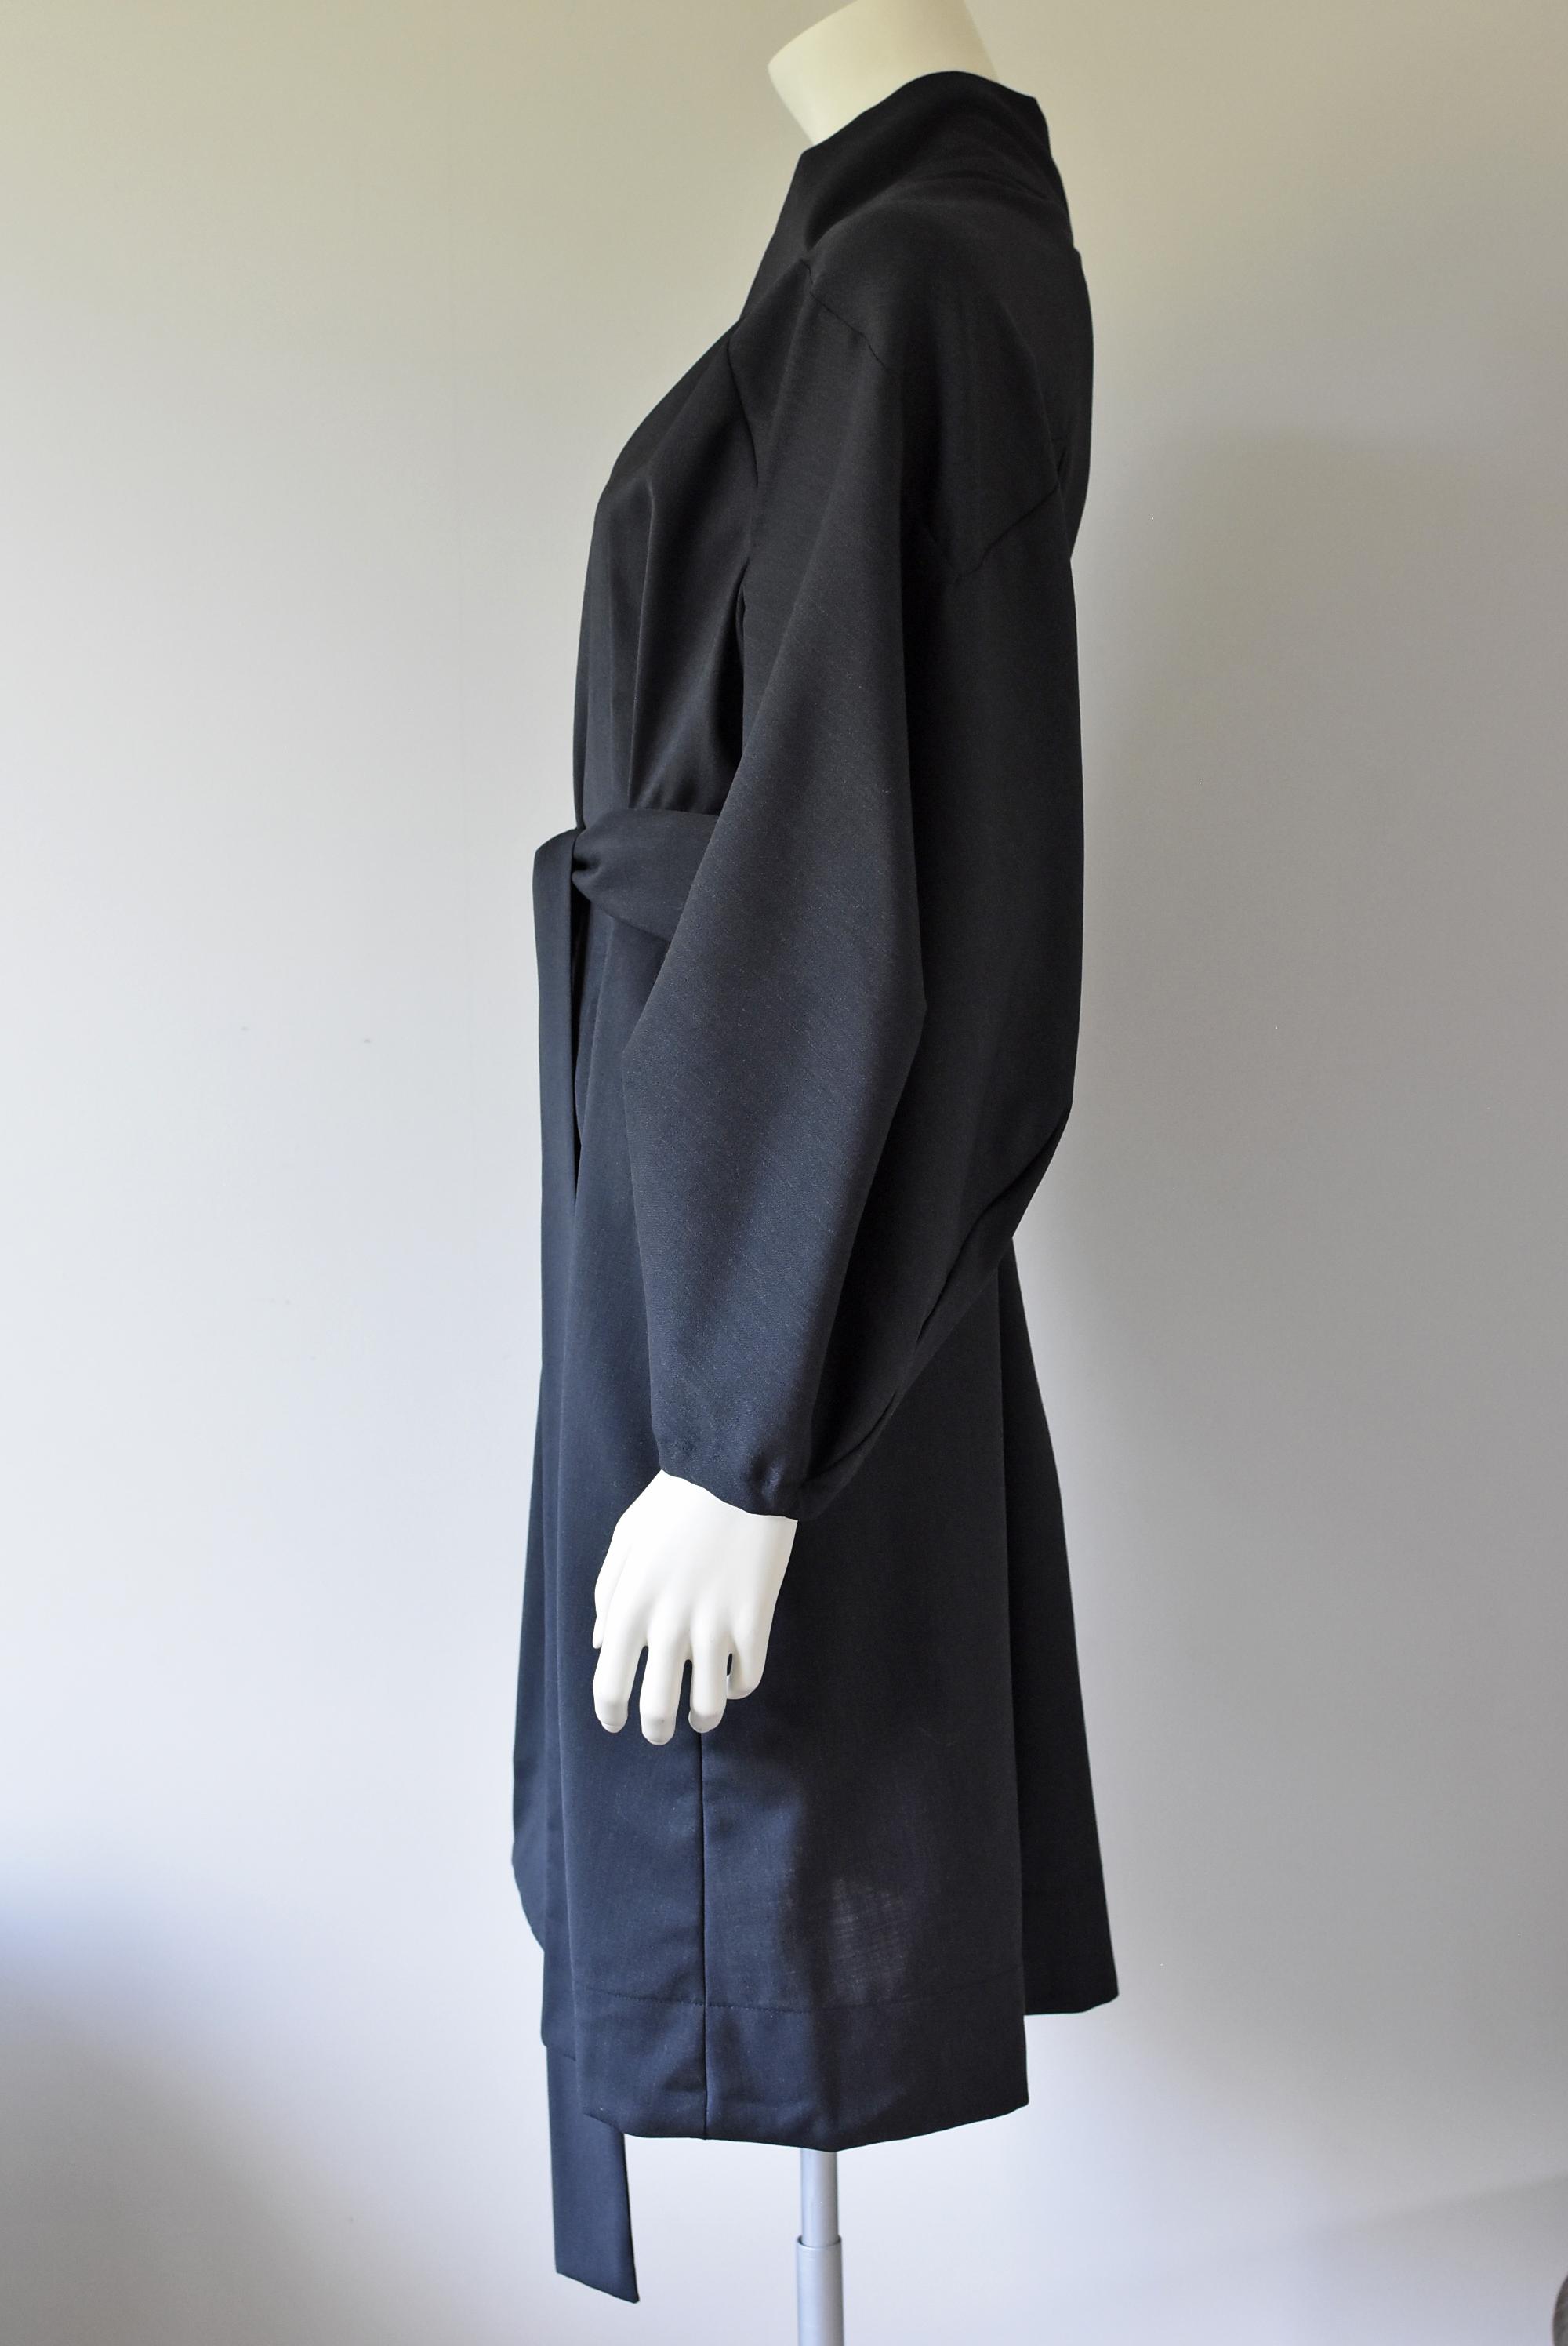 13 - BALOON-ARM-DRESS-COAT